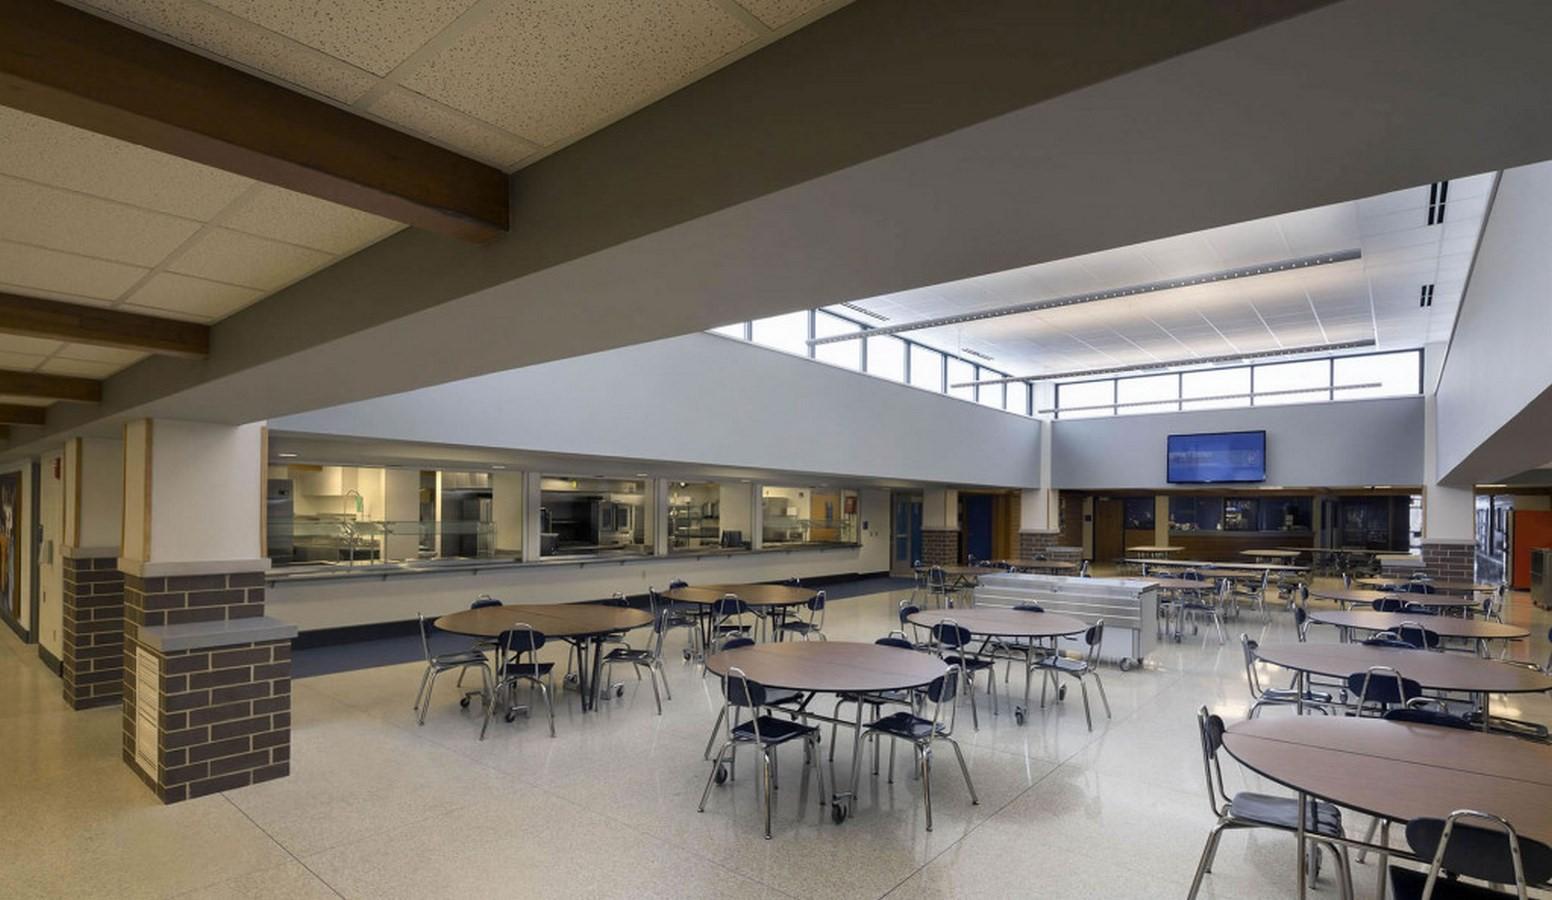 CAMBRIDGE SCHOOL DISTRICT - Sheet1